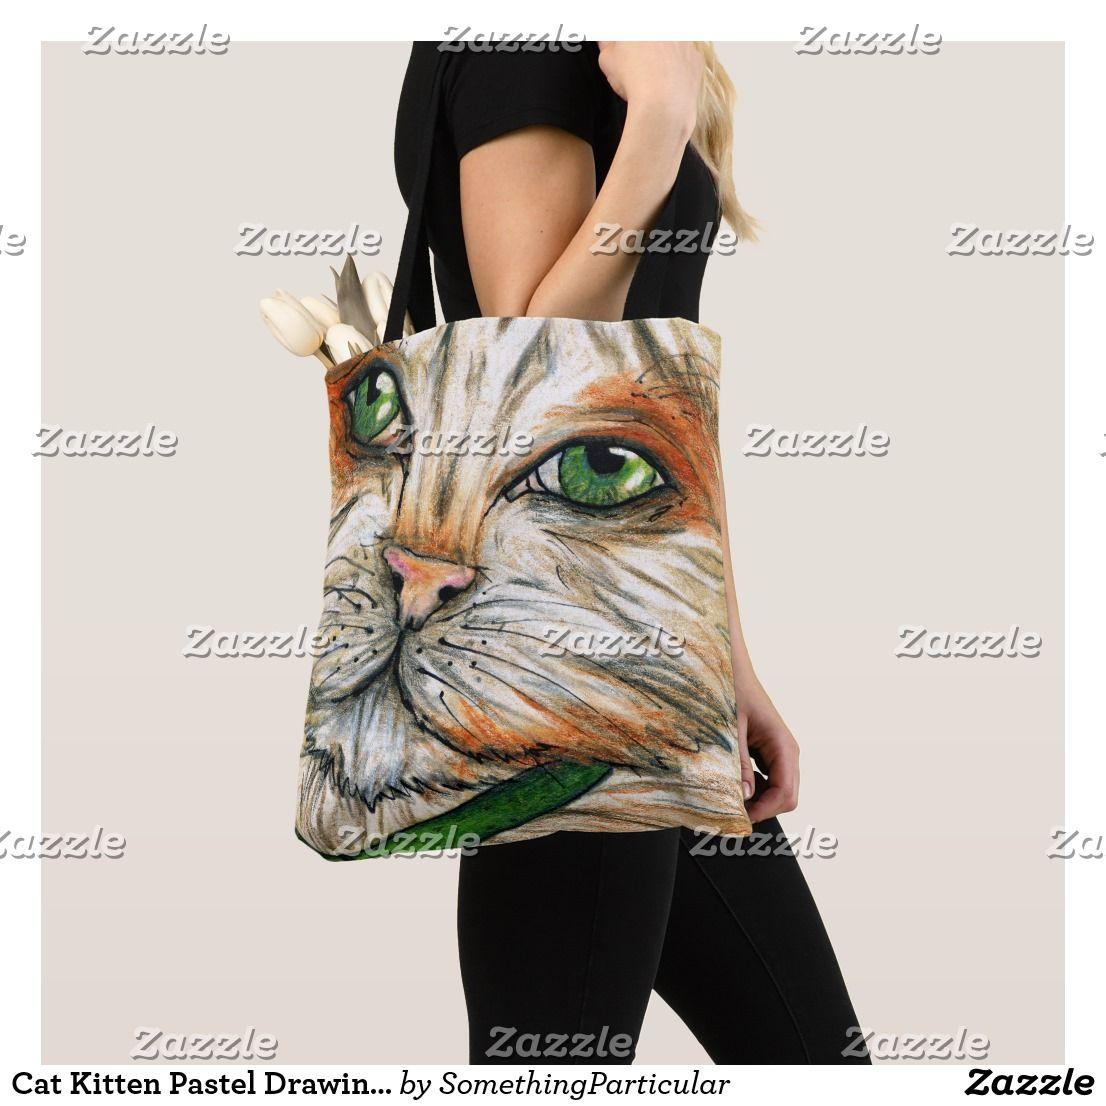 Cat Kitten Pet Turtle Flower Garden Shoulder Bag Handbag Shopping Tote Handmade Designcer Shoulderbag Cat Wallpaper Cats And Kittens Cat Artwork